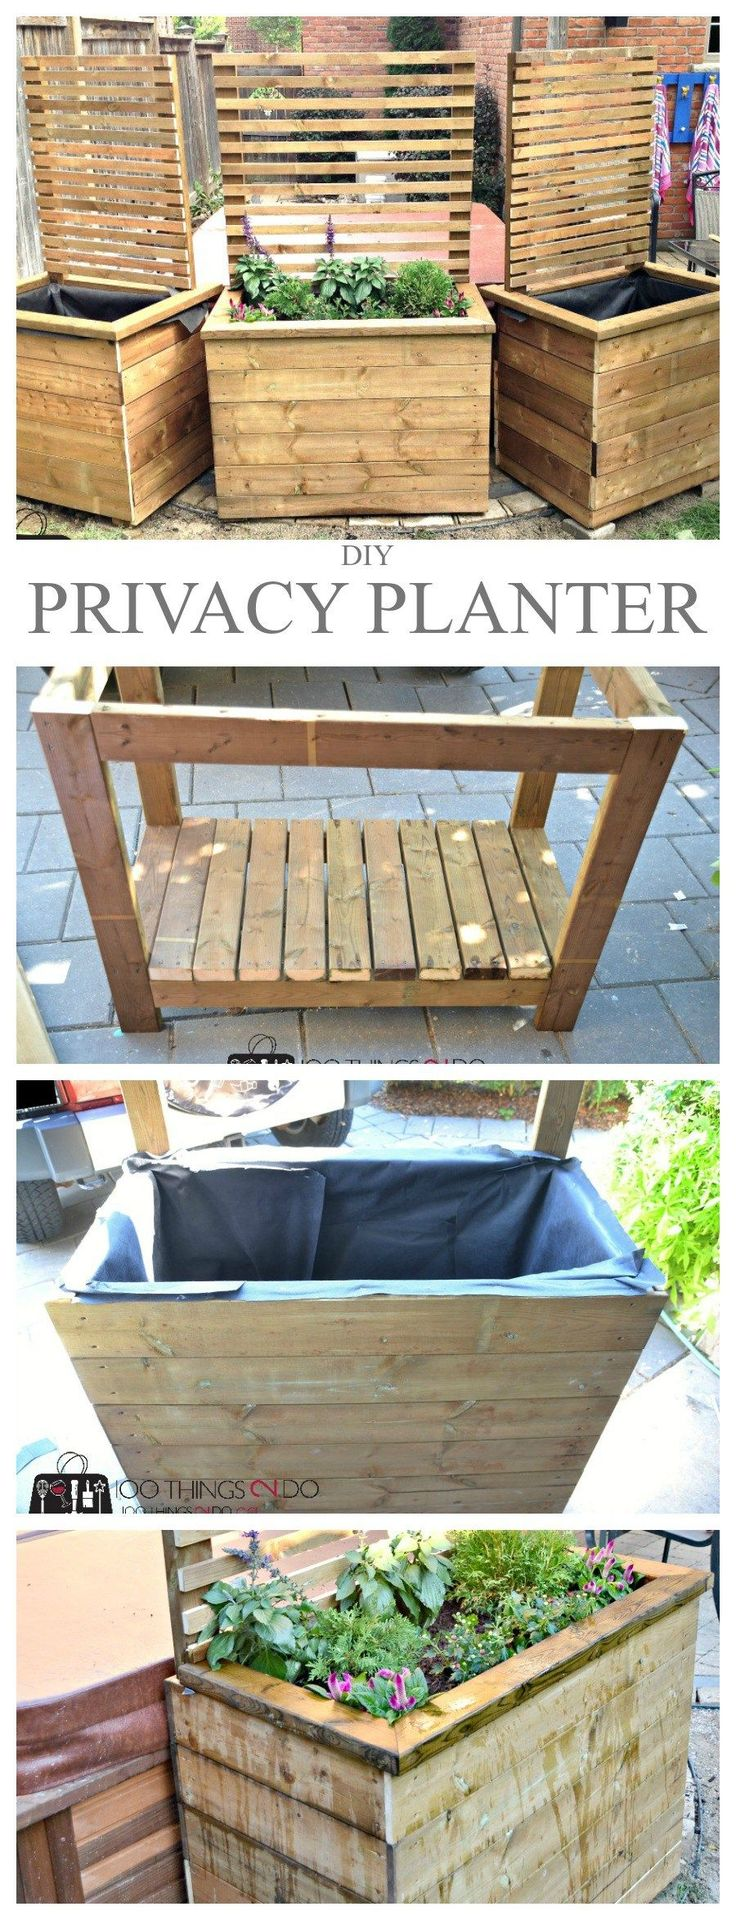 DIY privacy planter, DIY privacy screen, privacy screen, planter with screen between the driveways